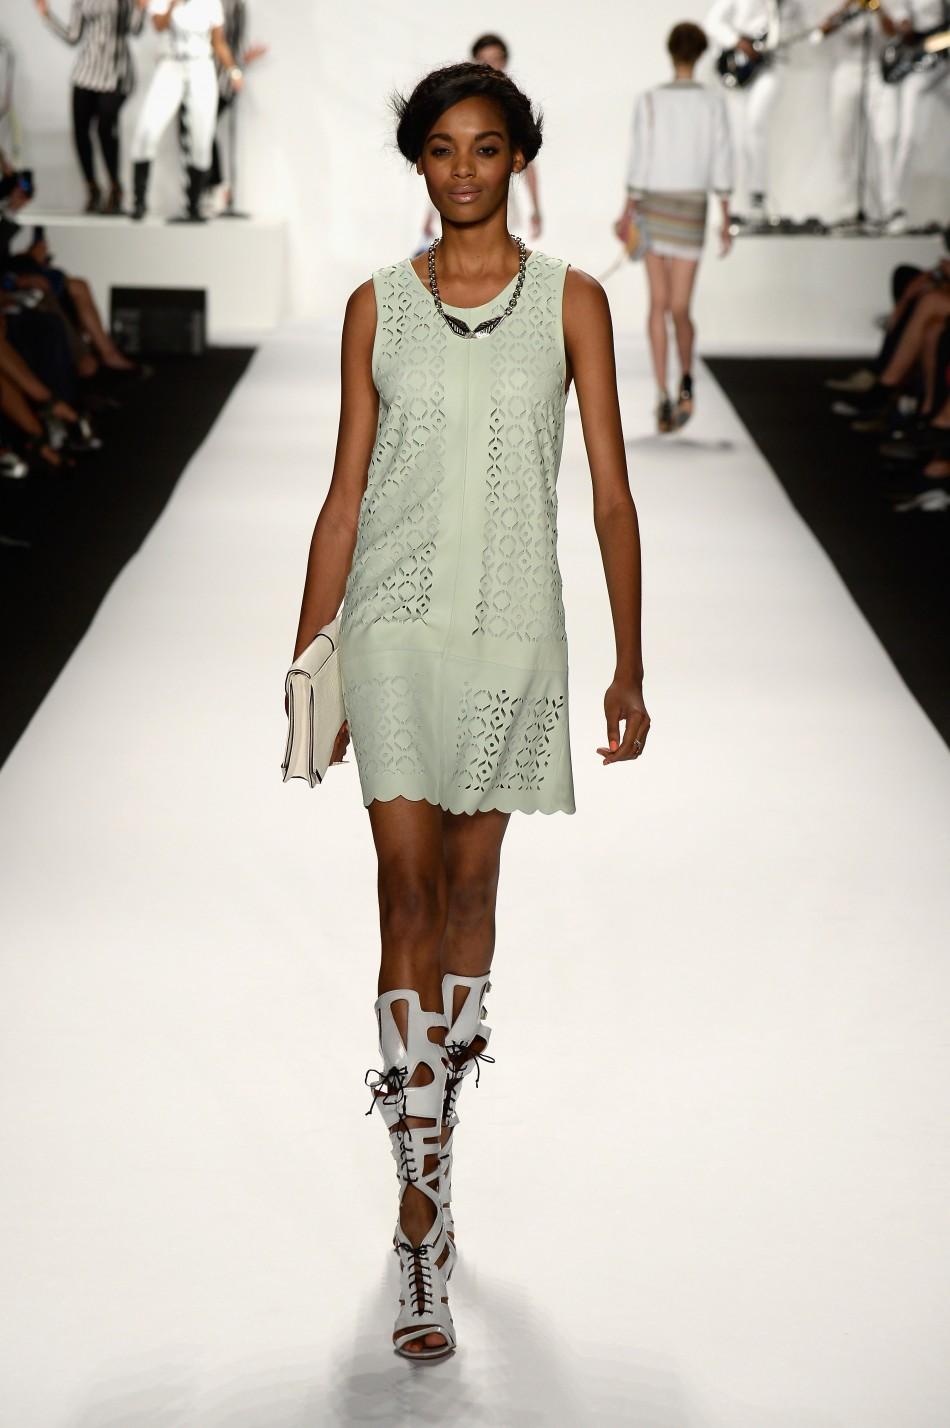 20585-rebecca-minkoff-spring-2014-new-york-fashion-week.jpg